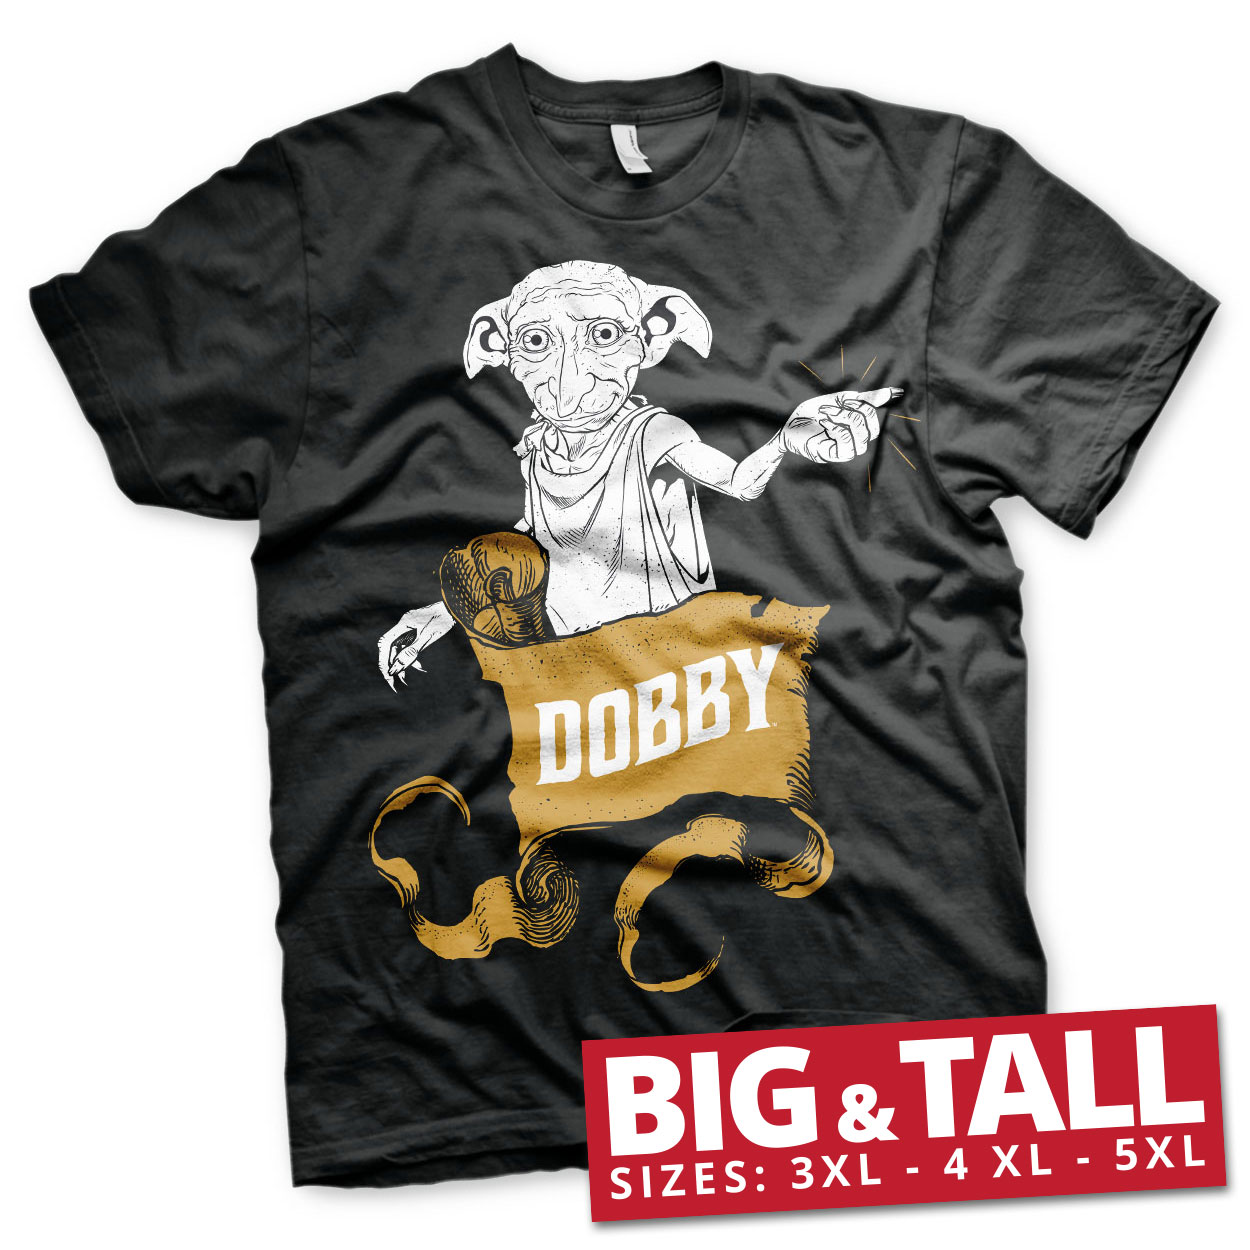 Harry Potter - Dobby Big & Tall T-Shirt